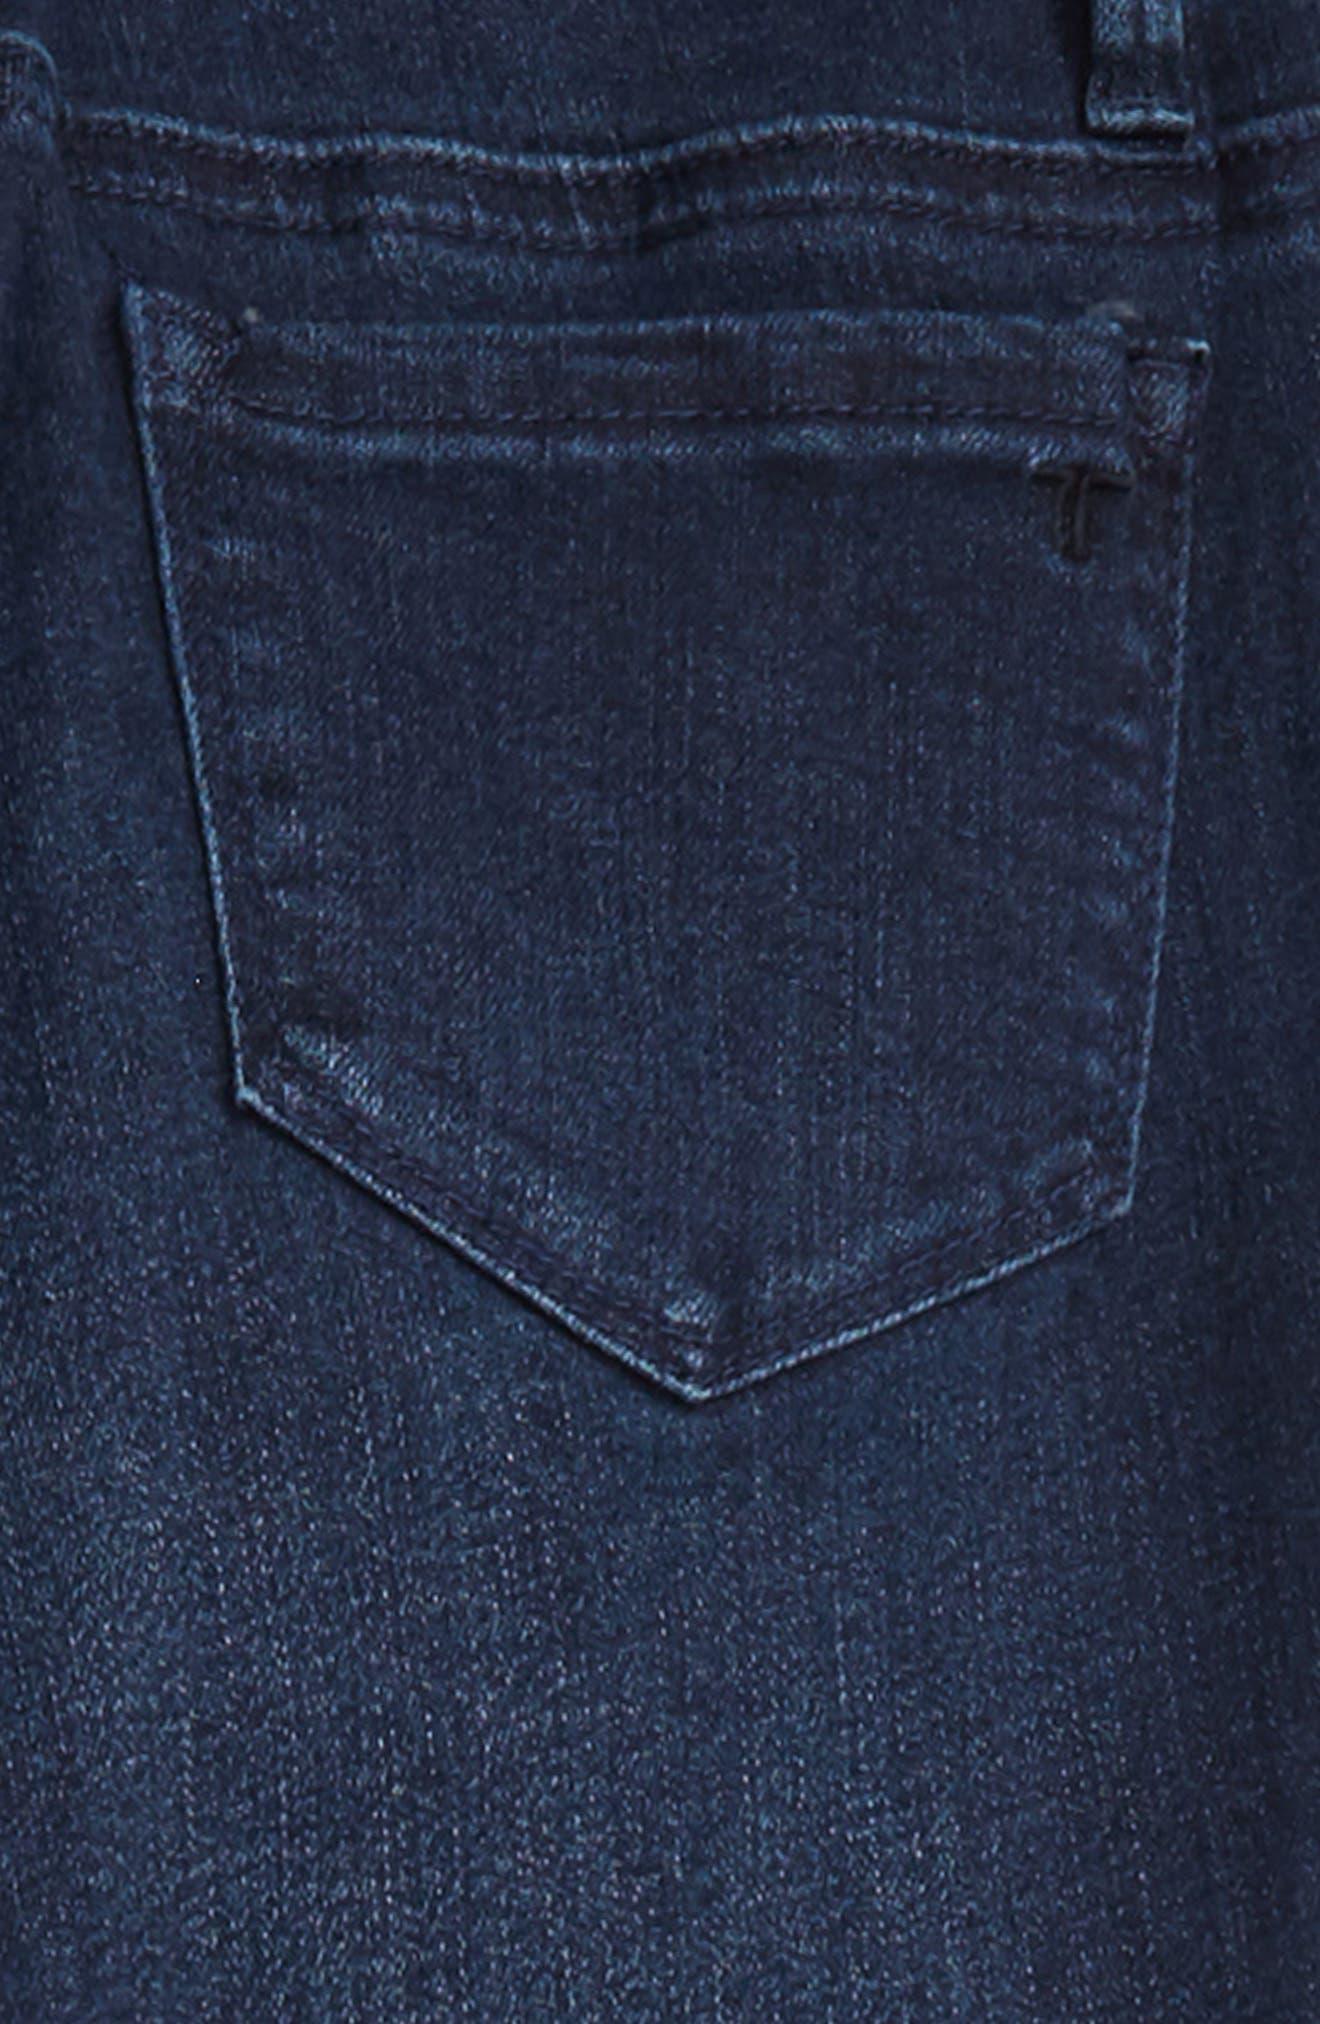 Studded Fray Hem Skinny Jeans,                             Alternate thumbnail 3, color,                             INDIGO